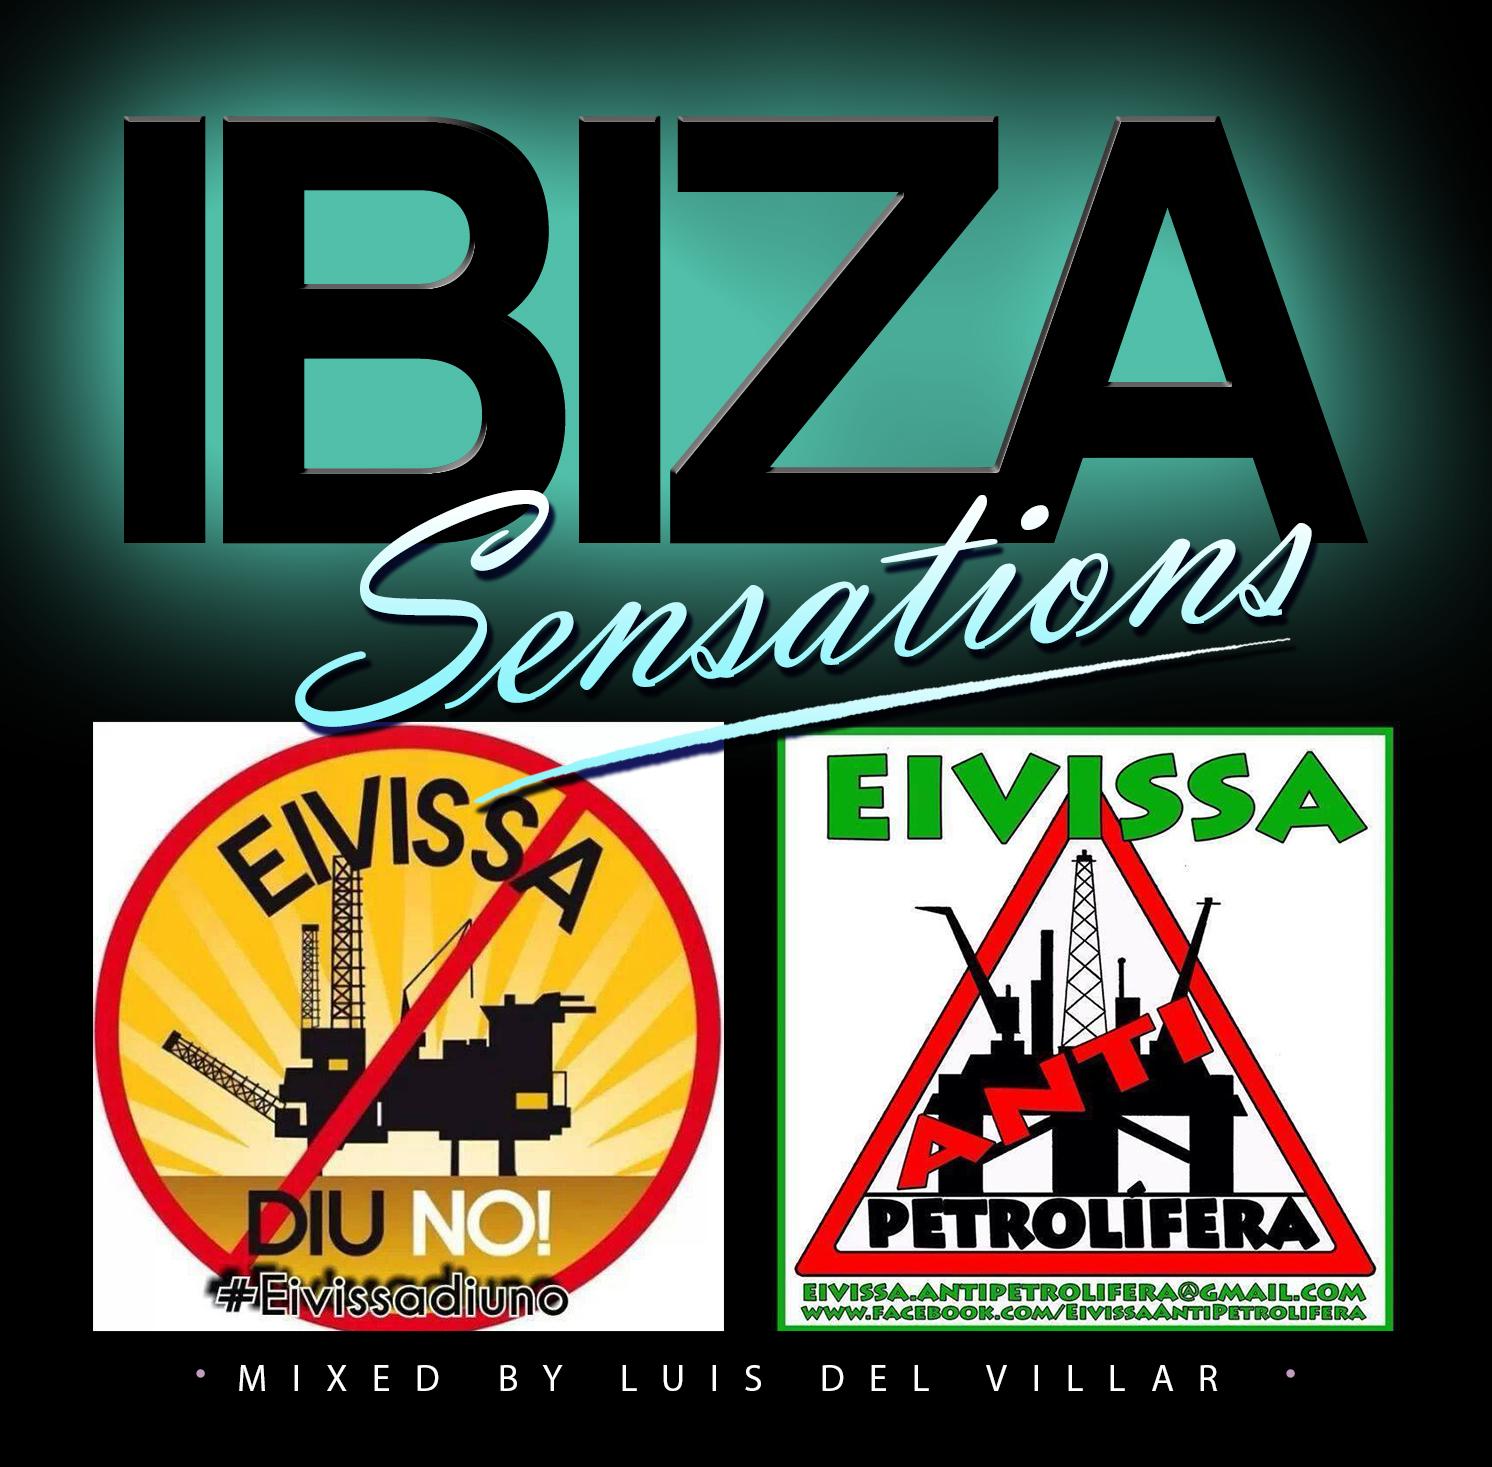 Artwork for Ibiza Sensations 87 Ibiza says NO to Oil prospections